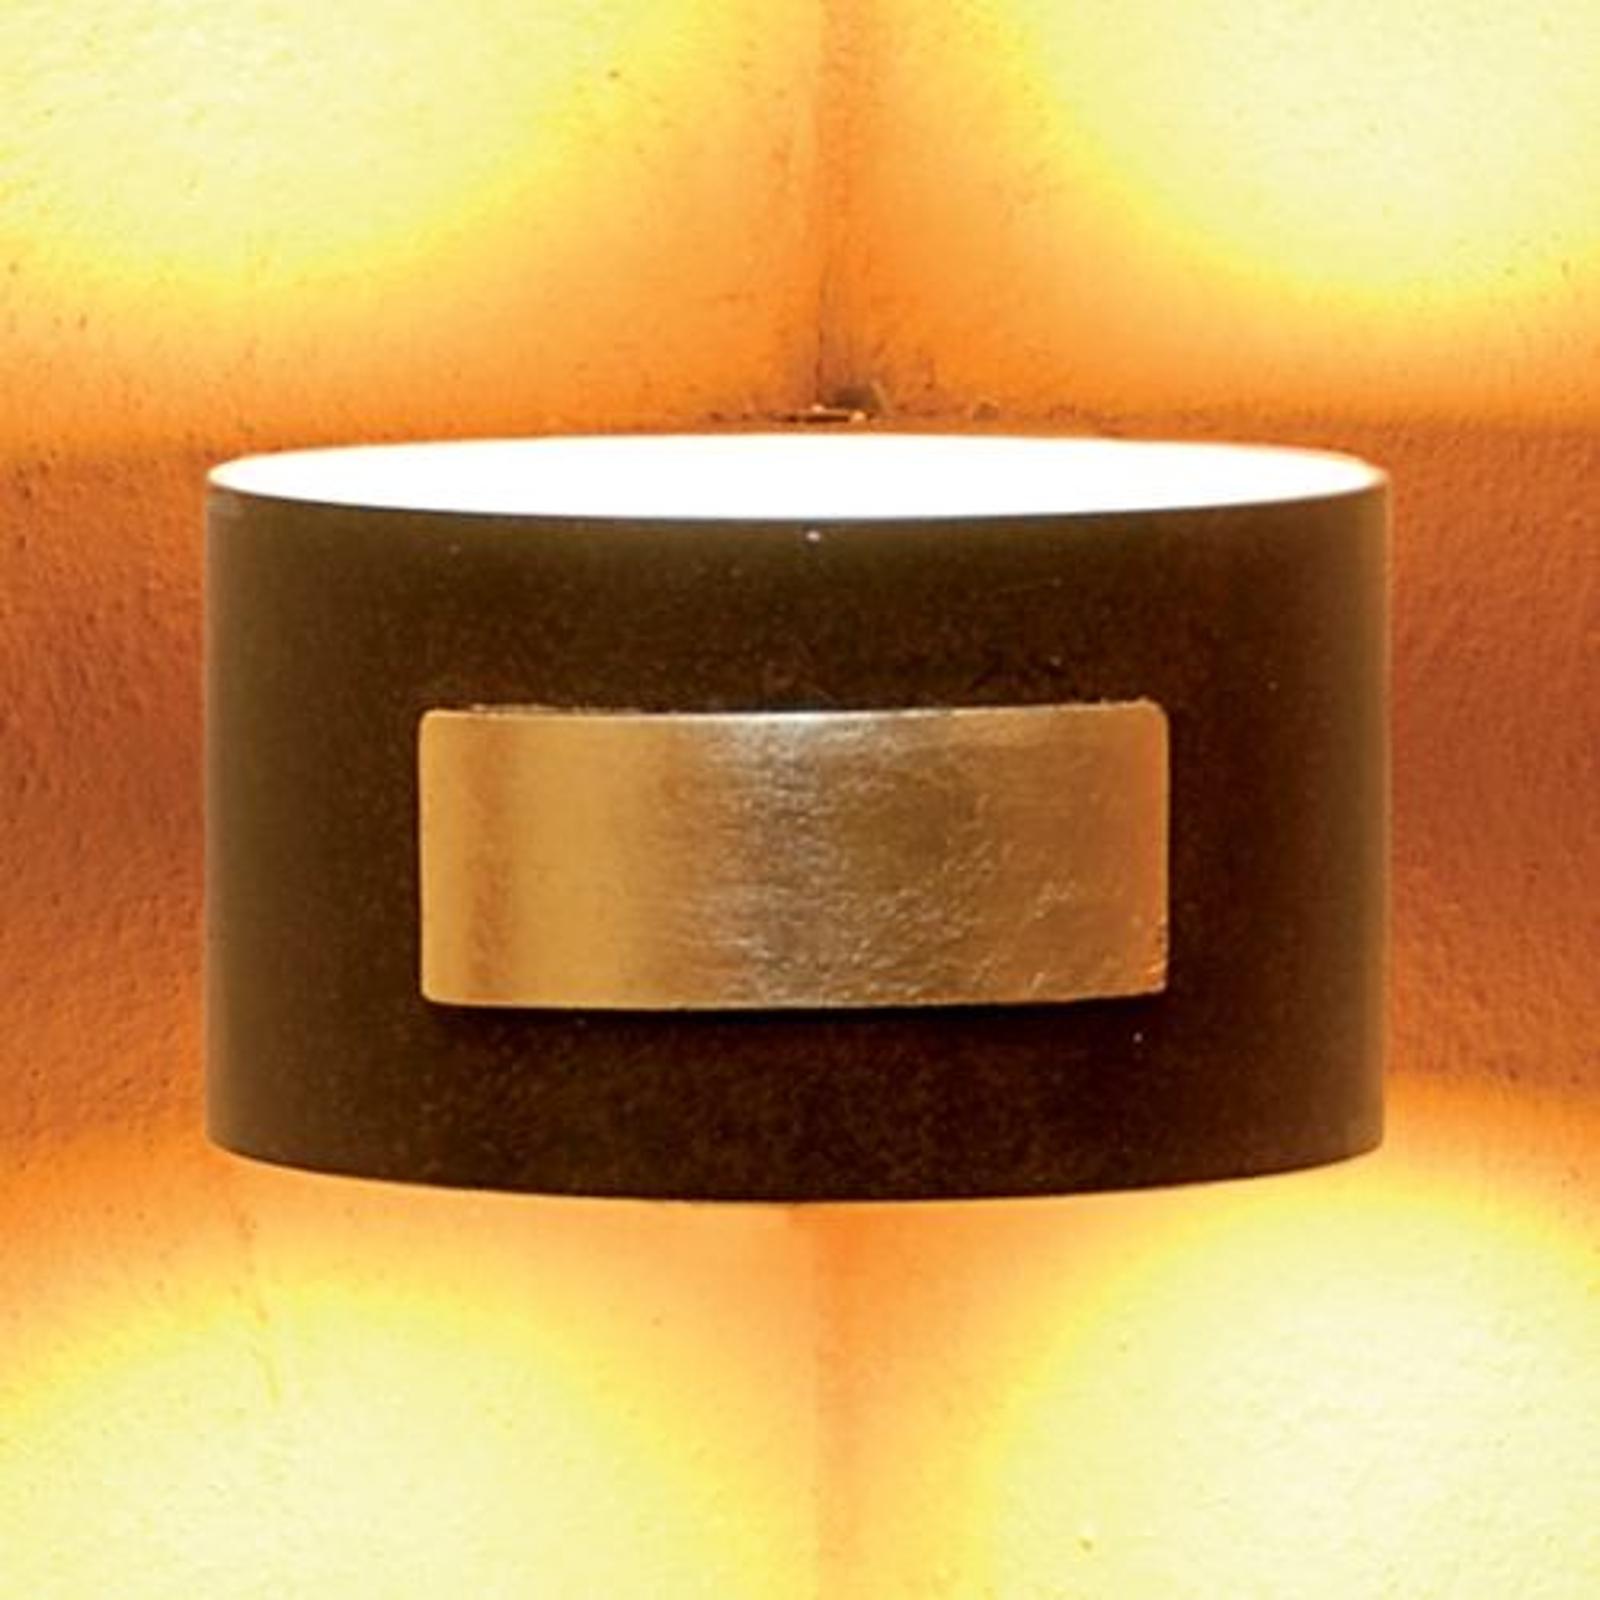 SMALL wandlamp voor hoekmontage, roest-goud